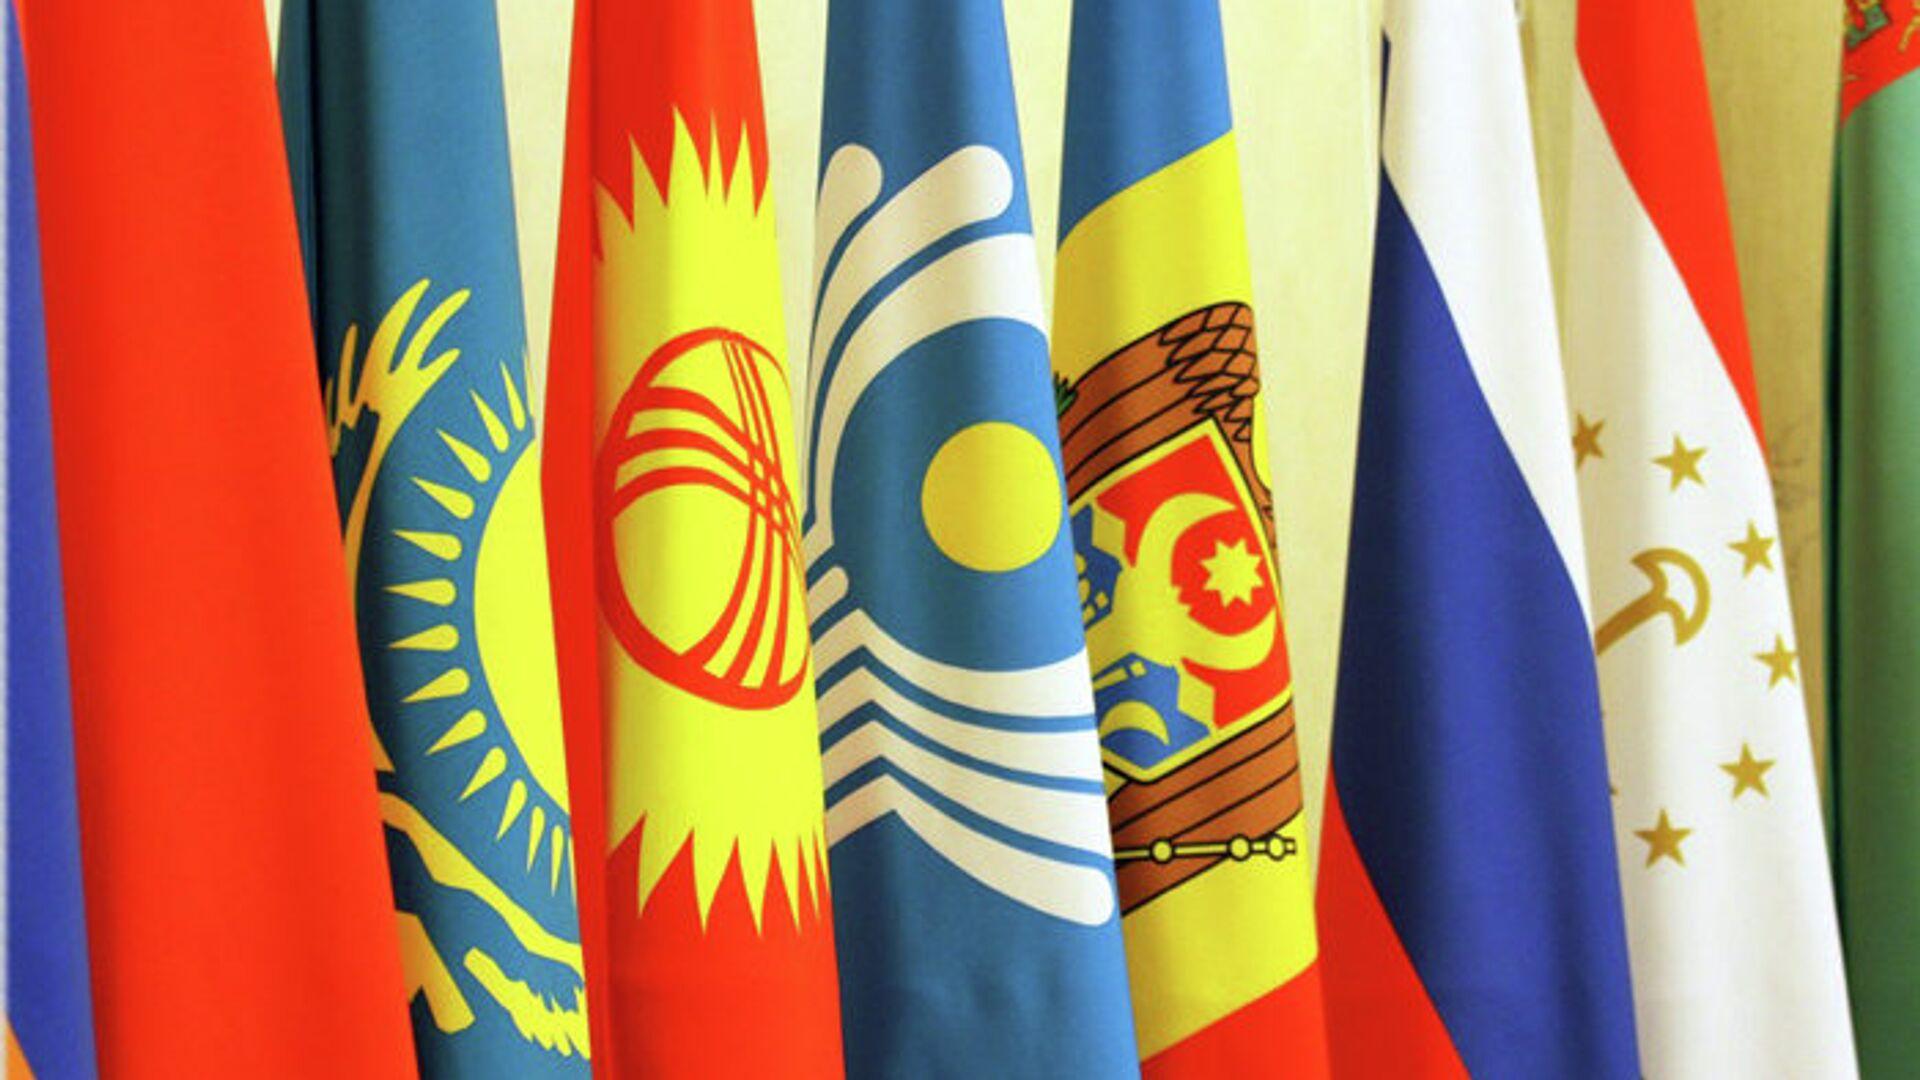 Флаги государств СНГ  - РИА Новости, 1920, 31.12.2020